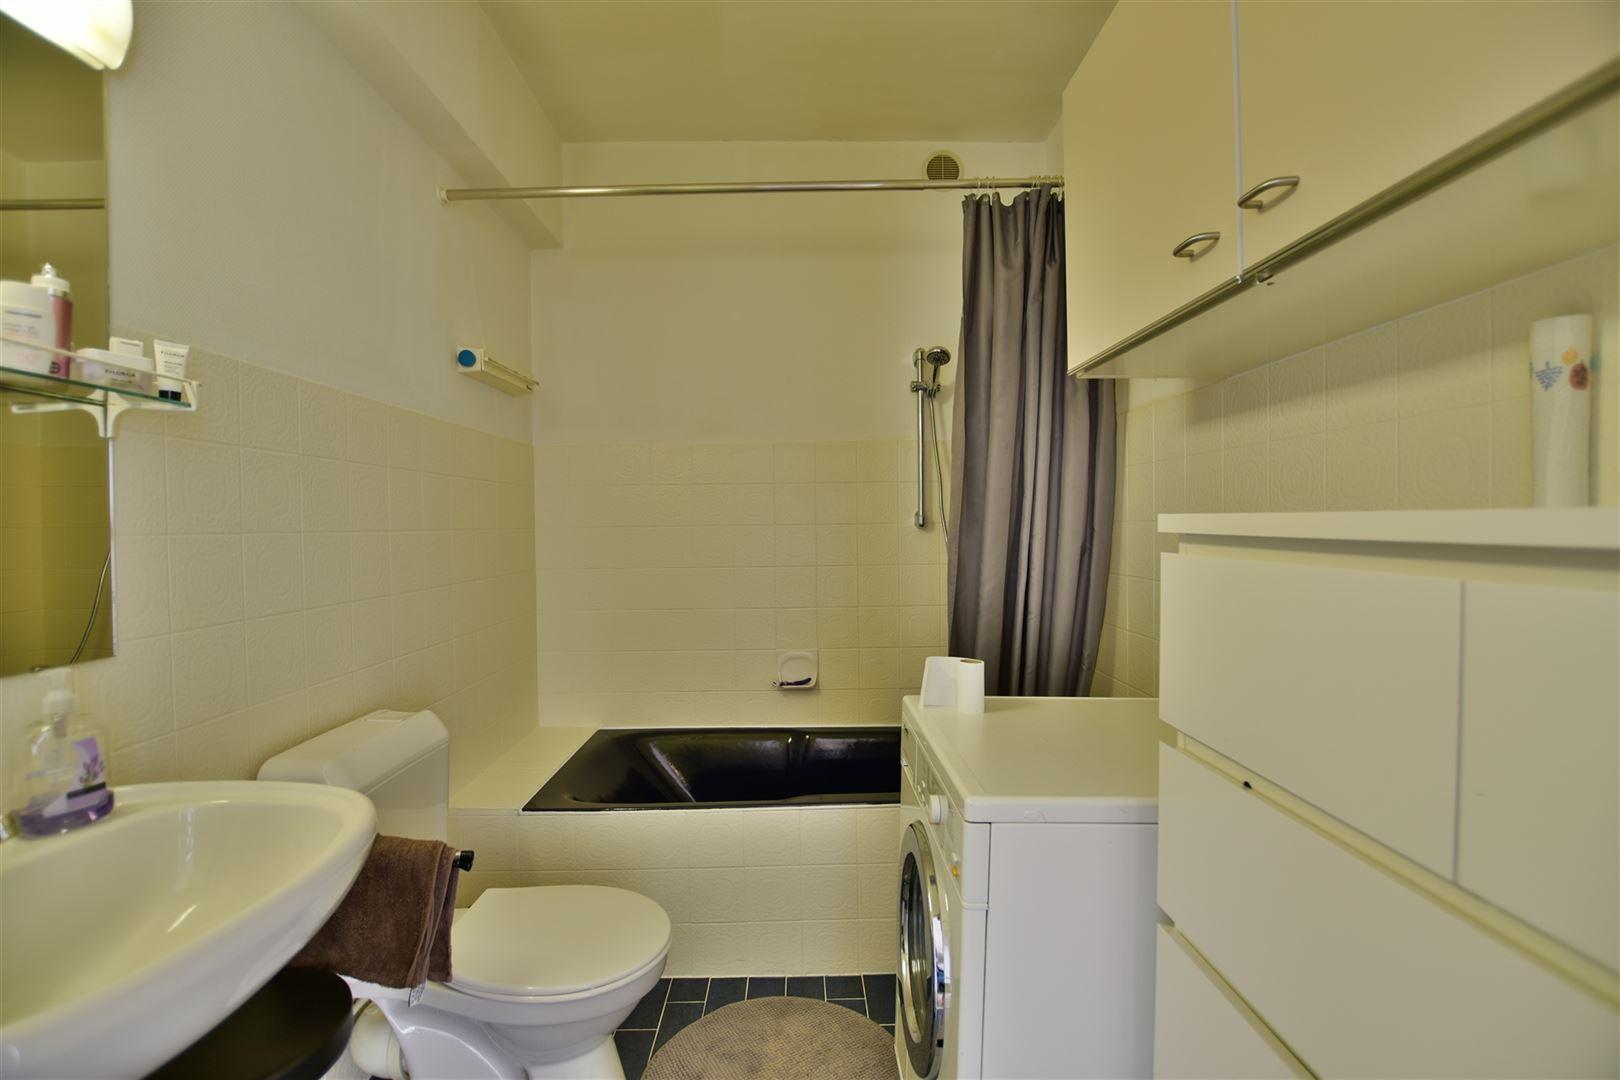 Foto 9 : Appartement te 9200 DENDERMONDE (België) - Prijs € 169.000